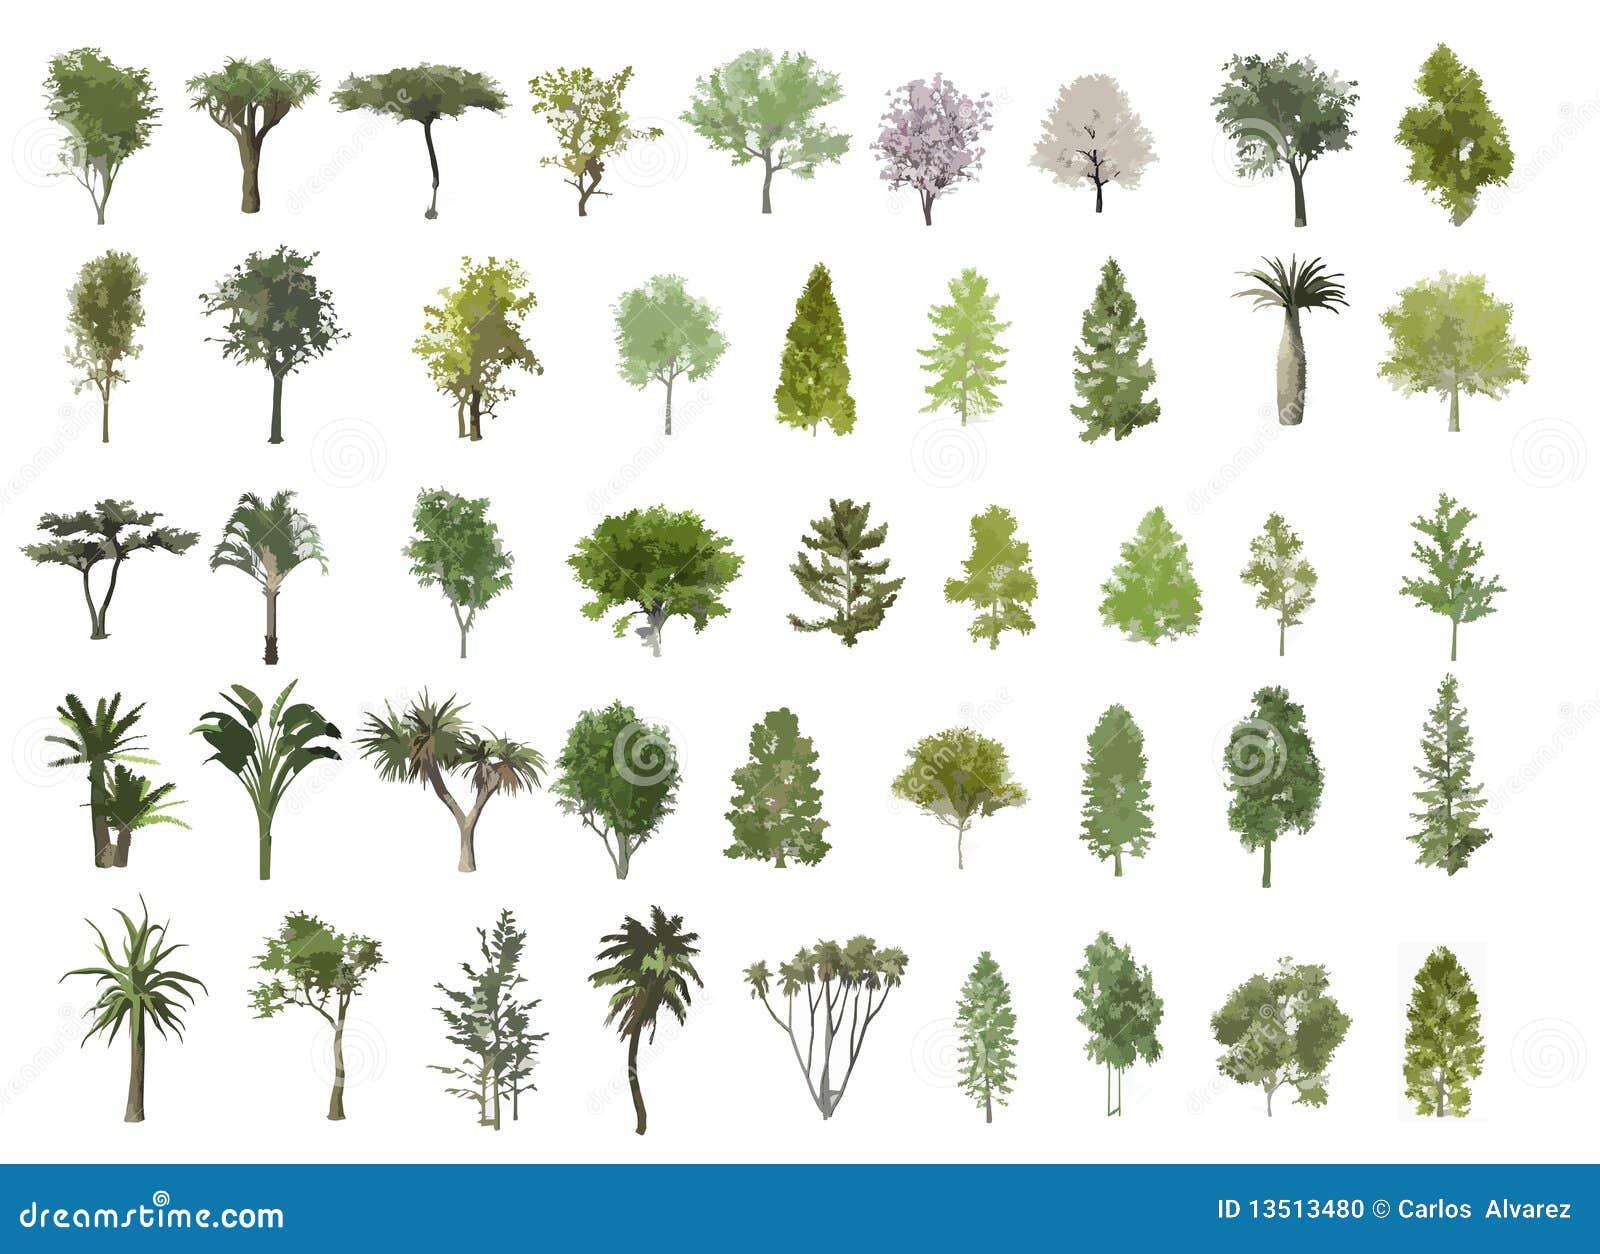 Illustrationtrees